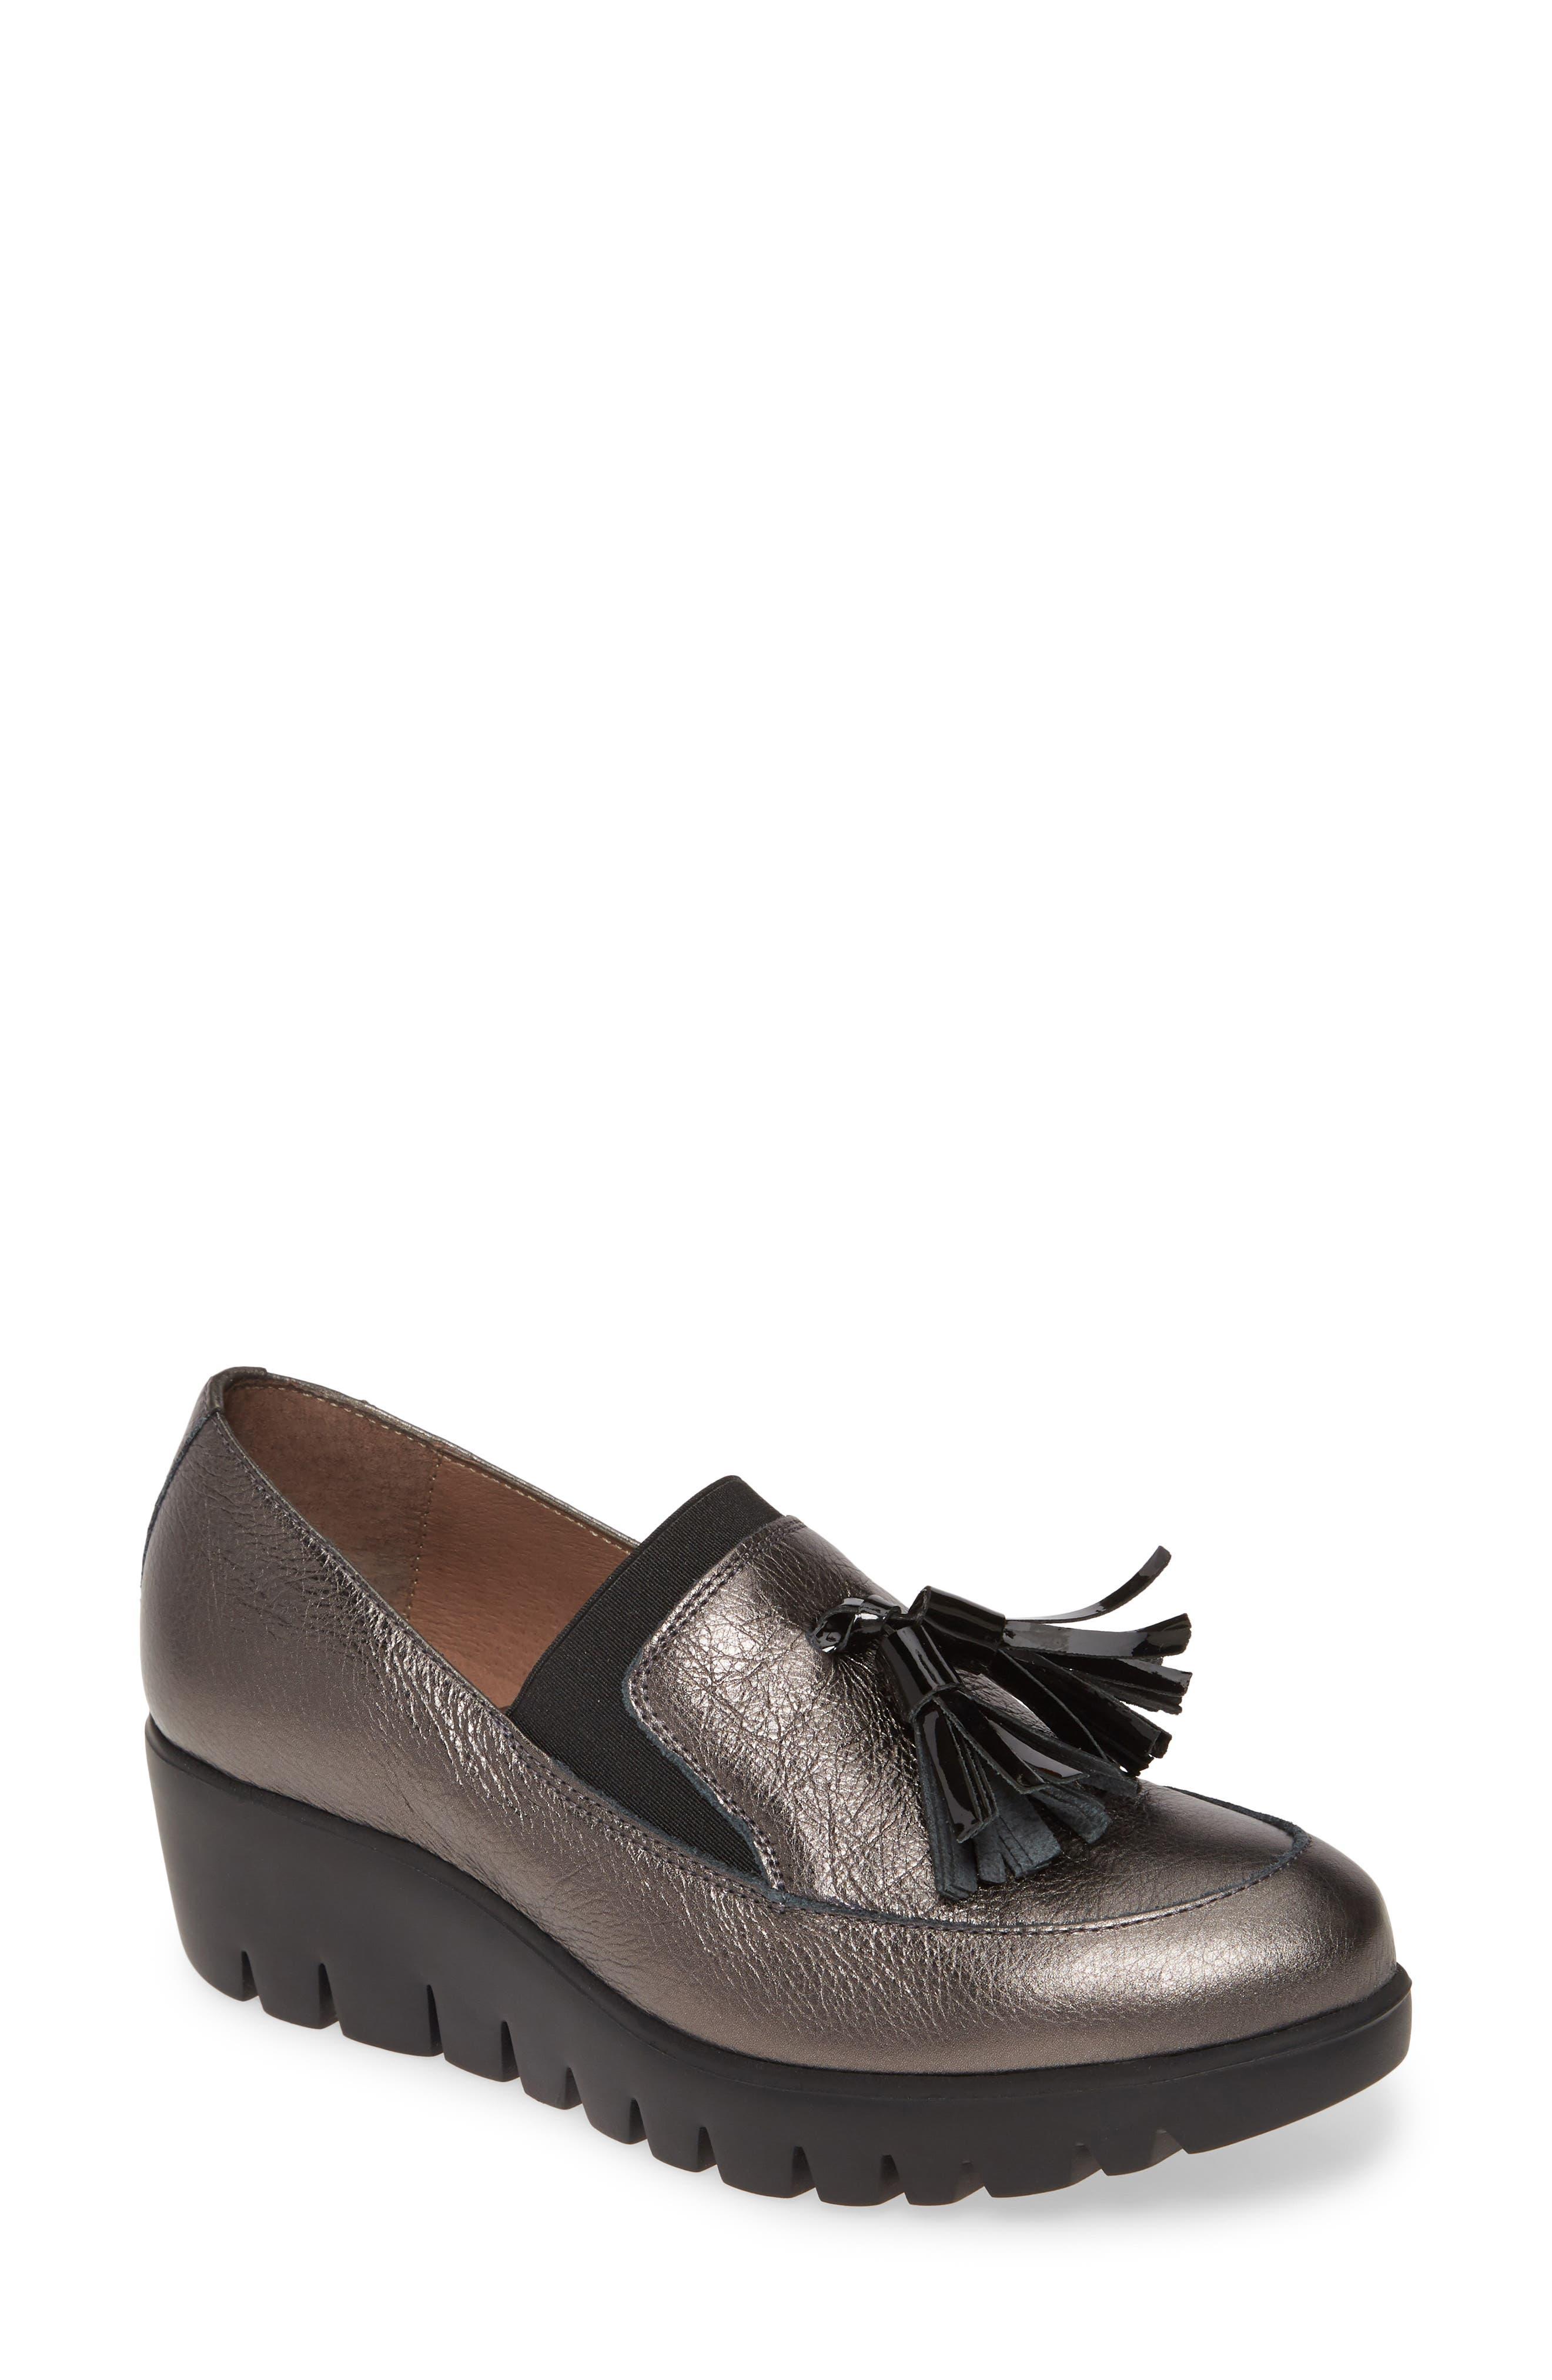 5160e4b8db648 Women's Wonders Shoes | Nordstrom